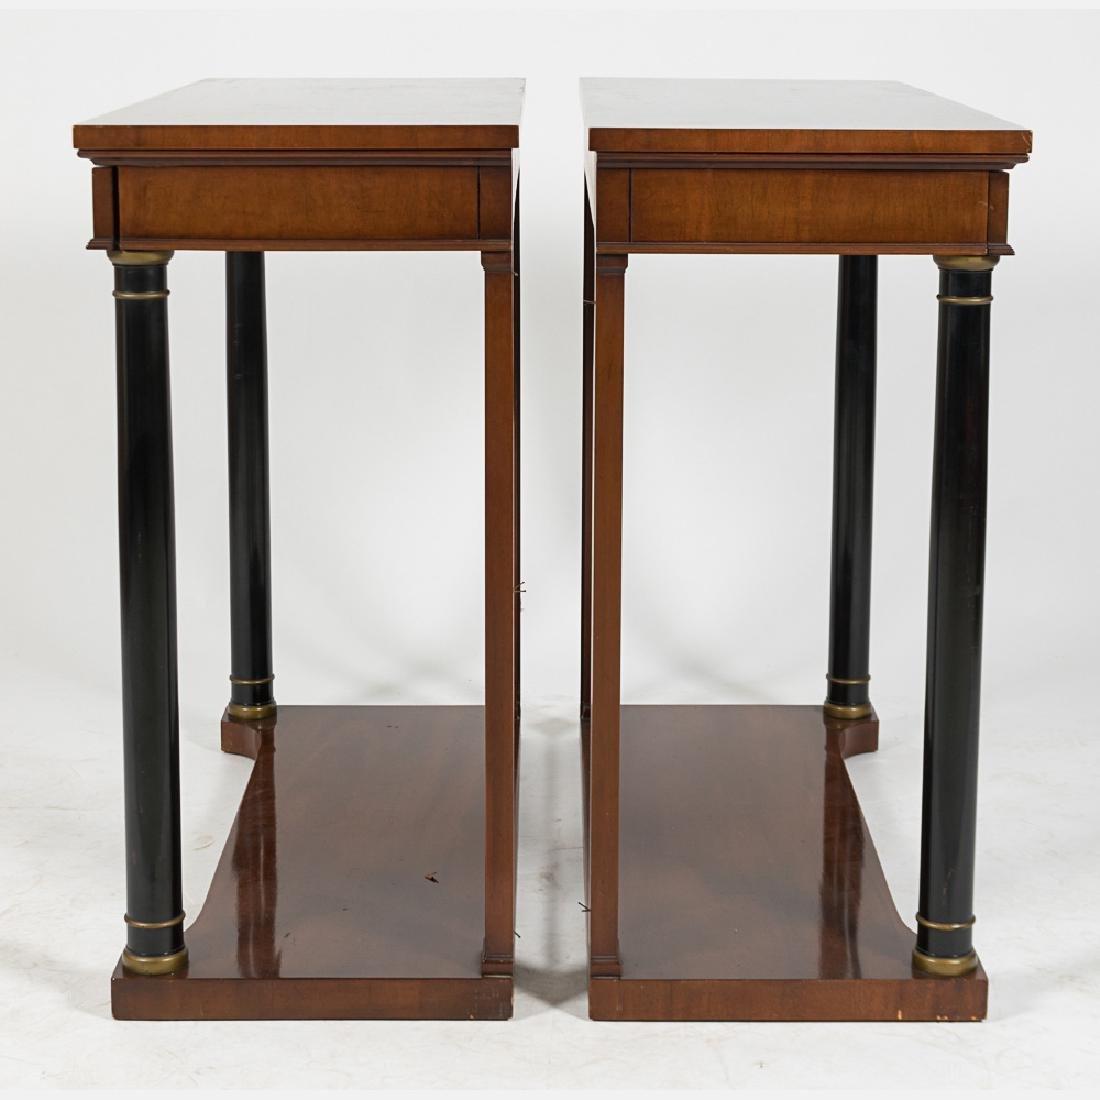 A Pair of Kittinger Mahogany and Ebonized Wood Console - 3